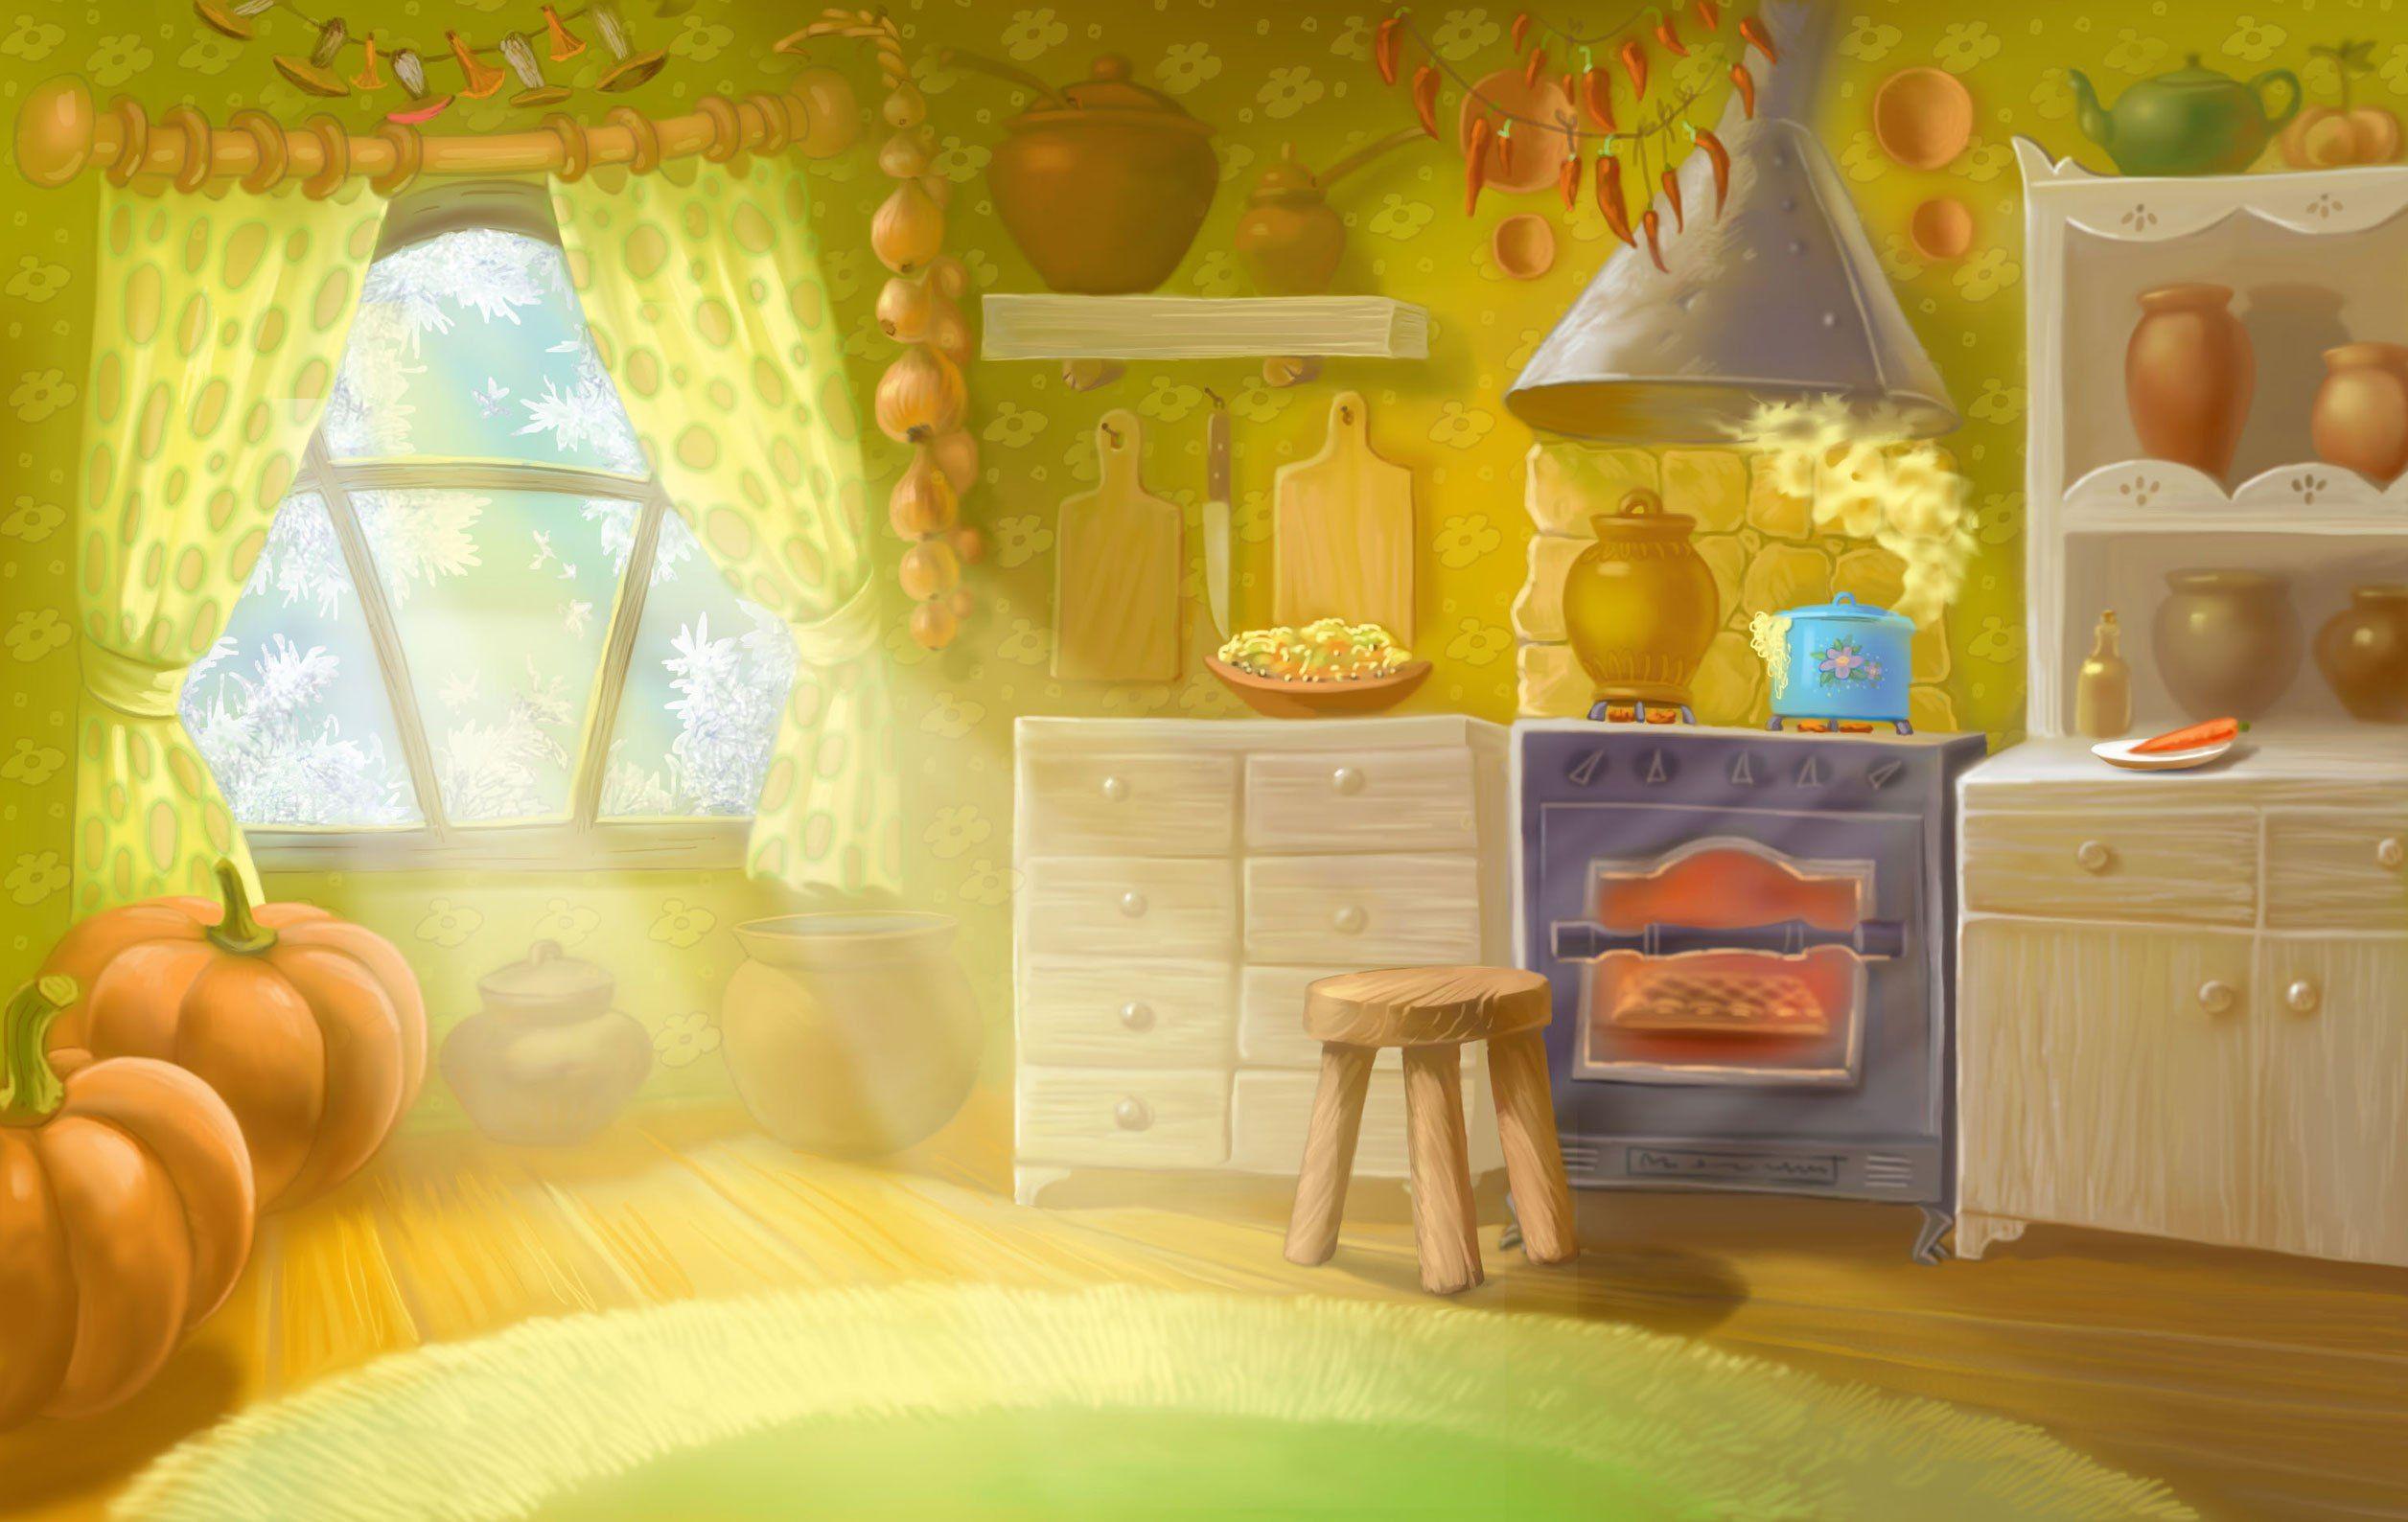 картинка фон внутри дома его